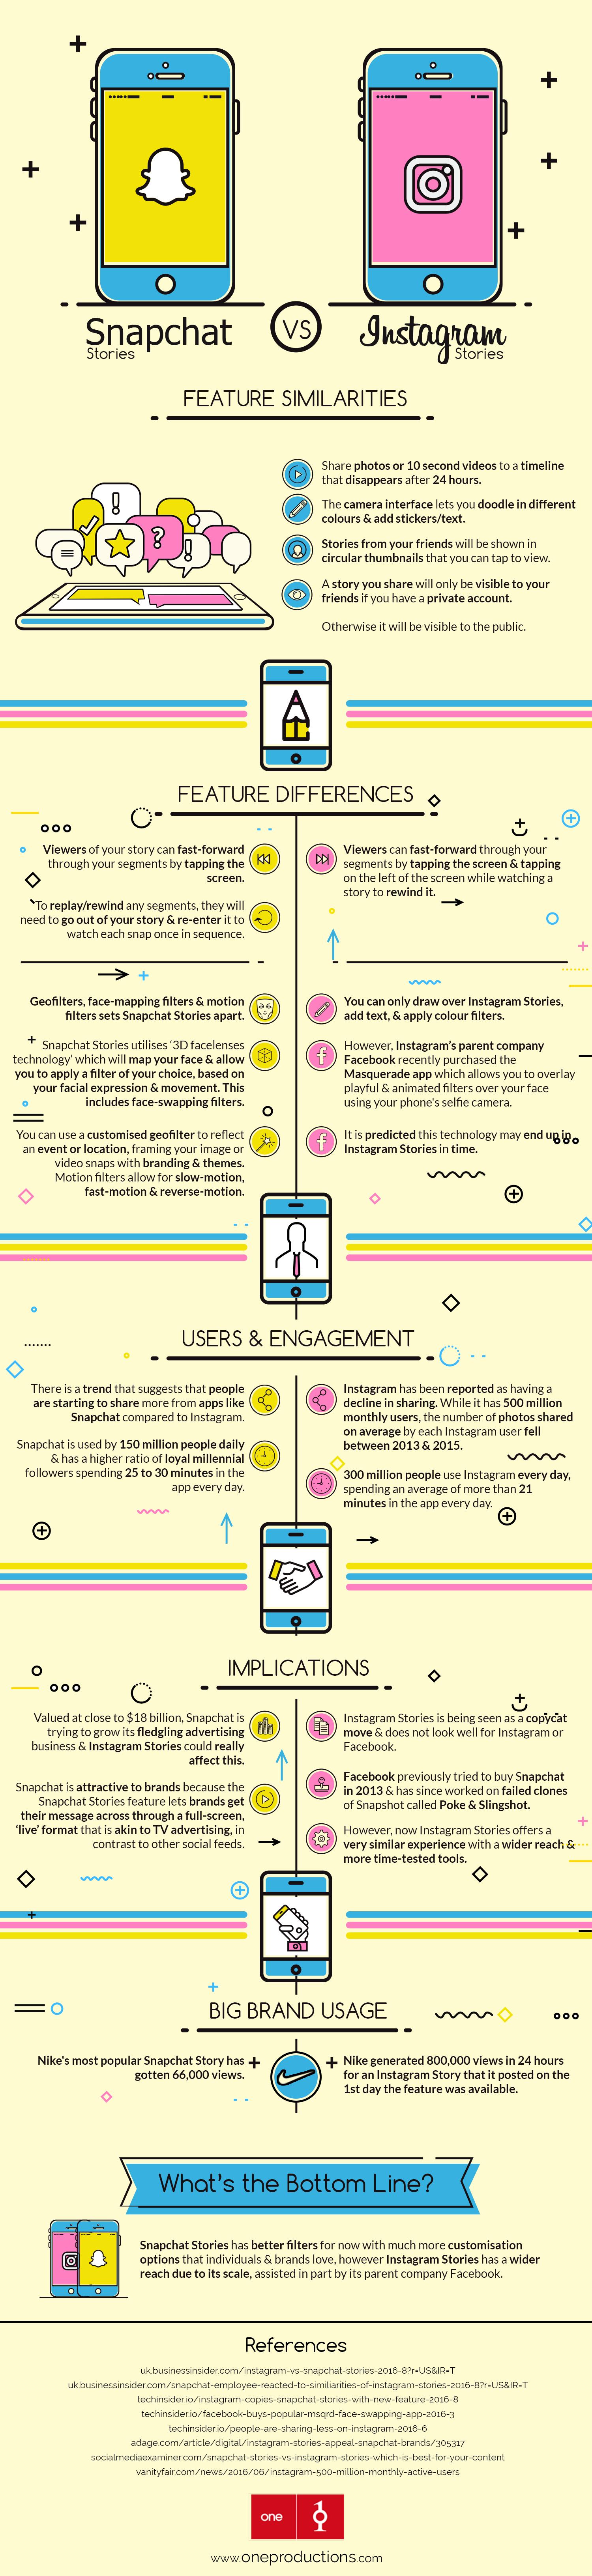 snapchat-stories-vs-instagram-stories-high-quality